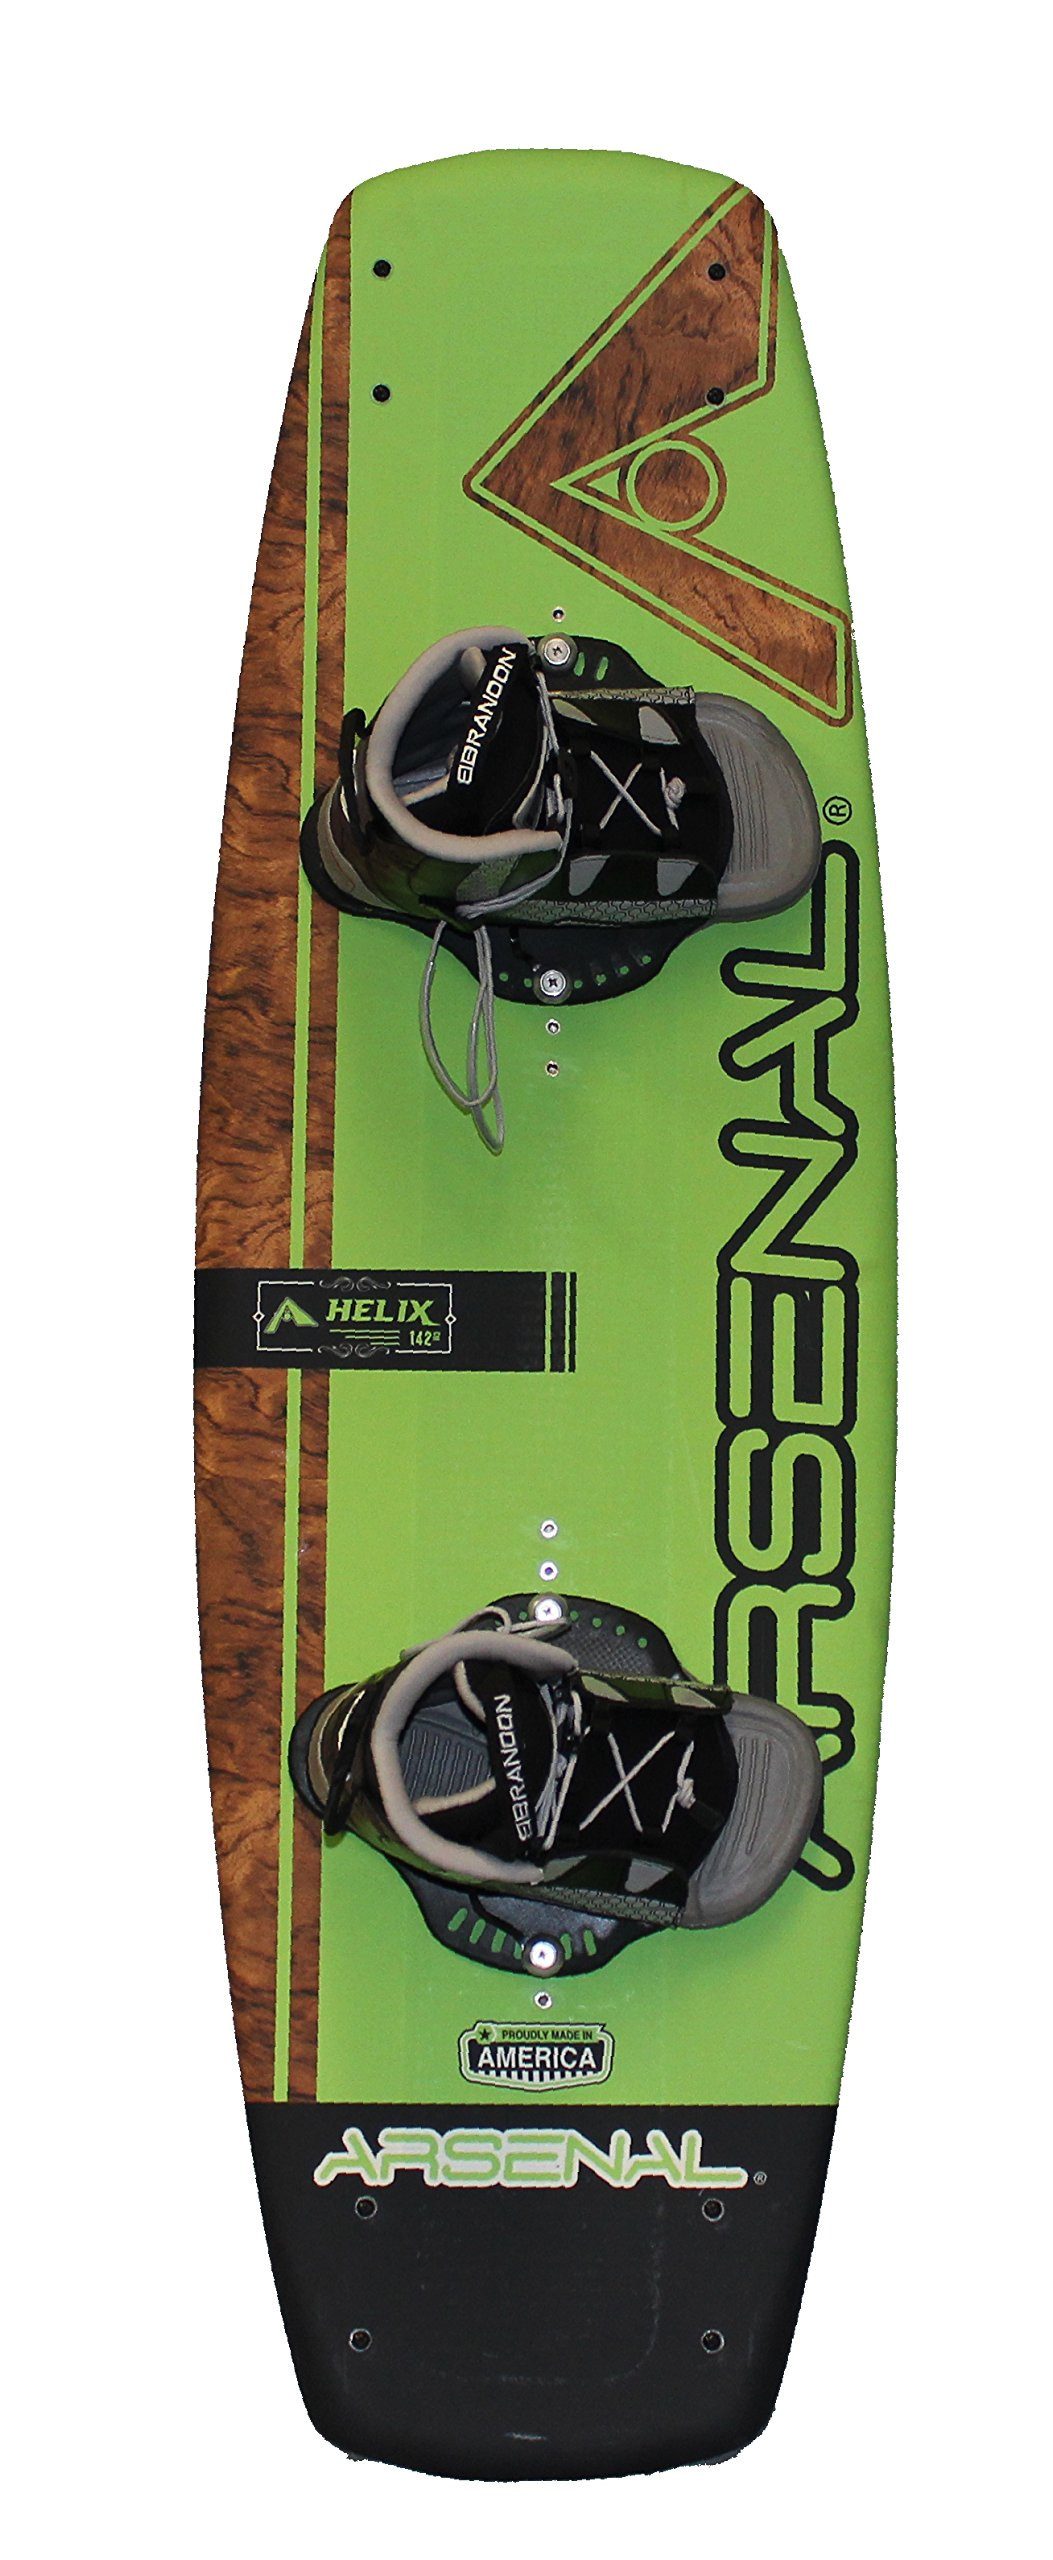 Hydroslide Arsenal Helix Wakeboard, Adult Universal,, Green